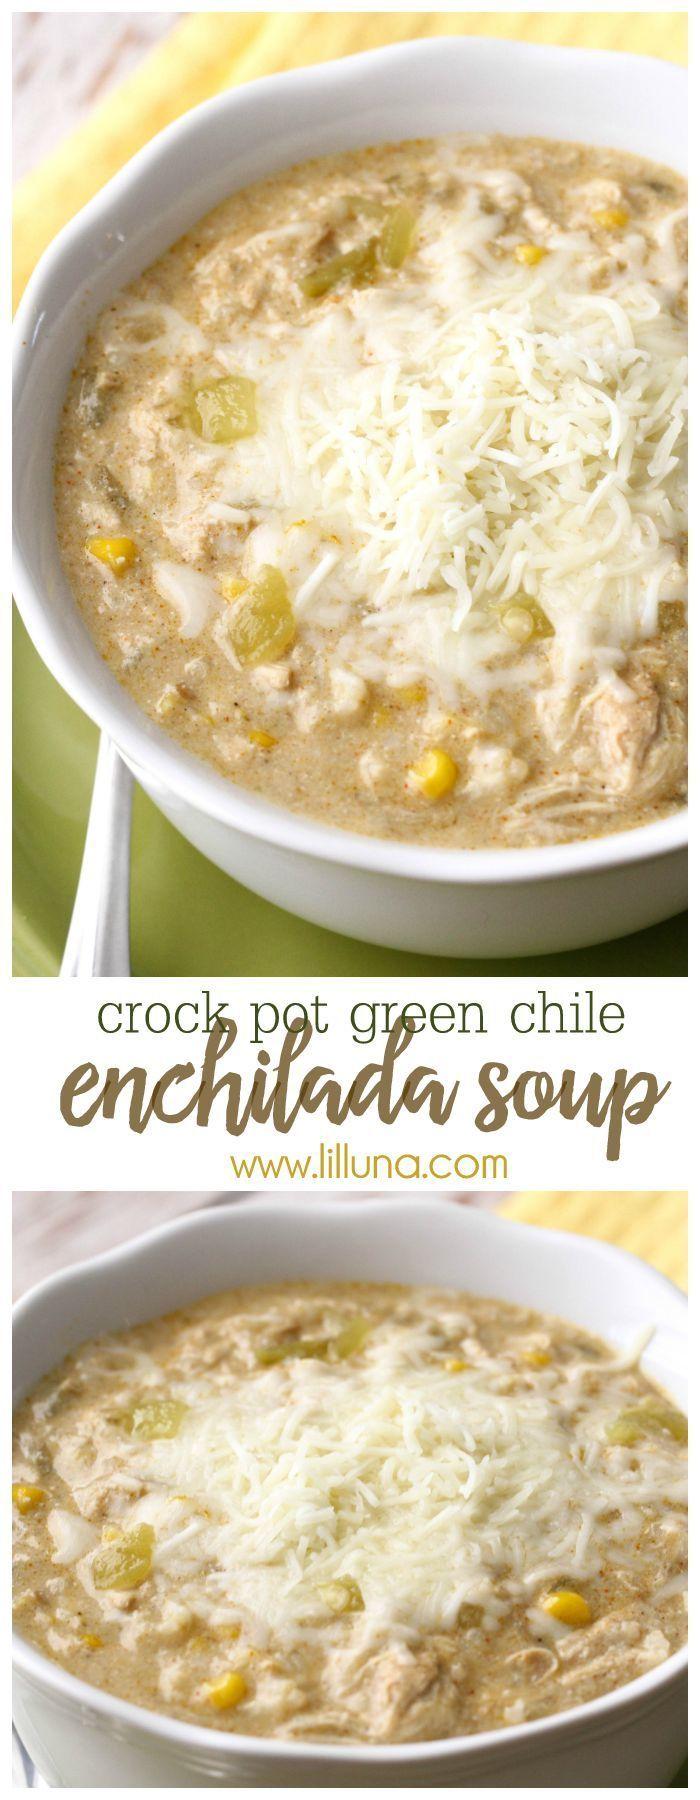 Crock Pot Green Chile Enchilada Soup - a new favorite soup recipe that is easy…